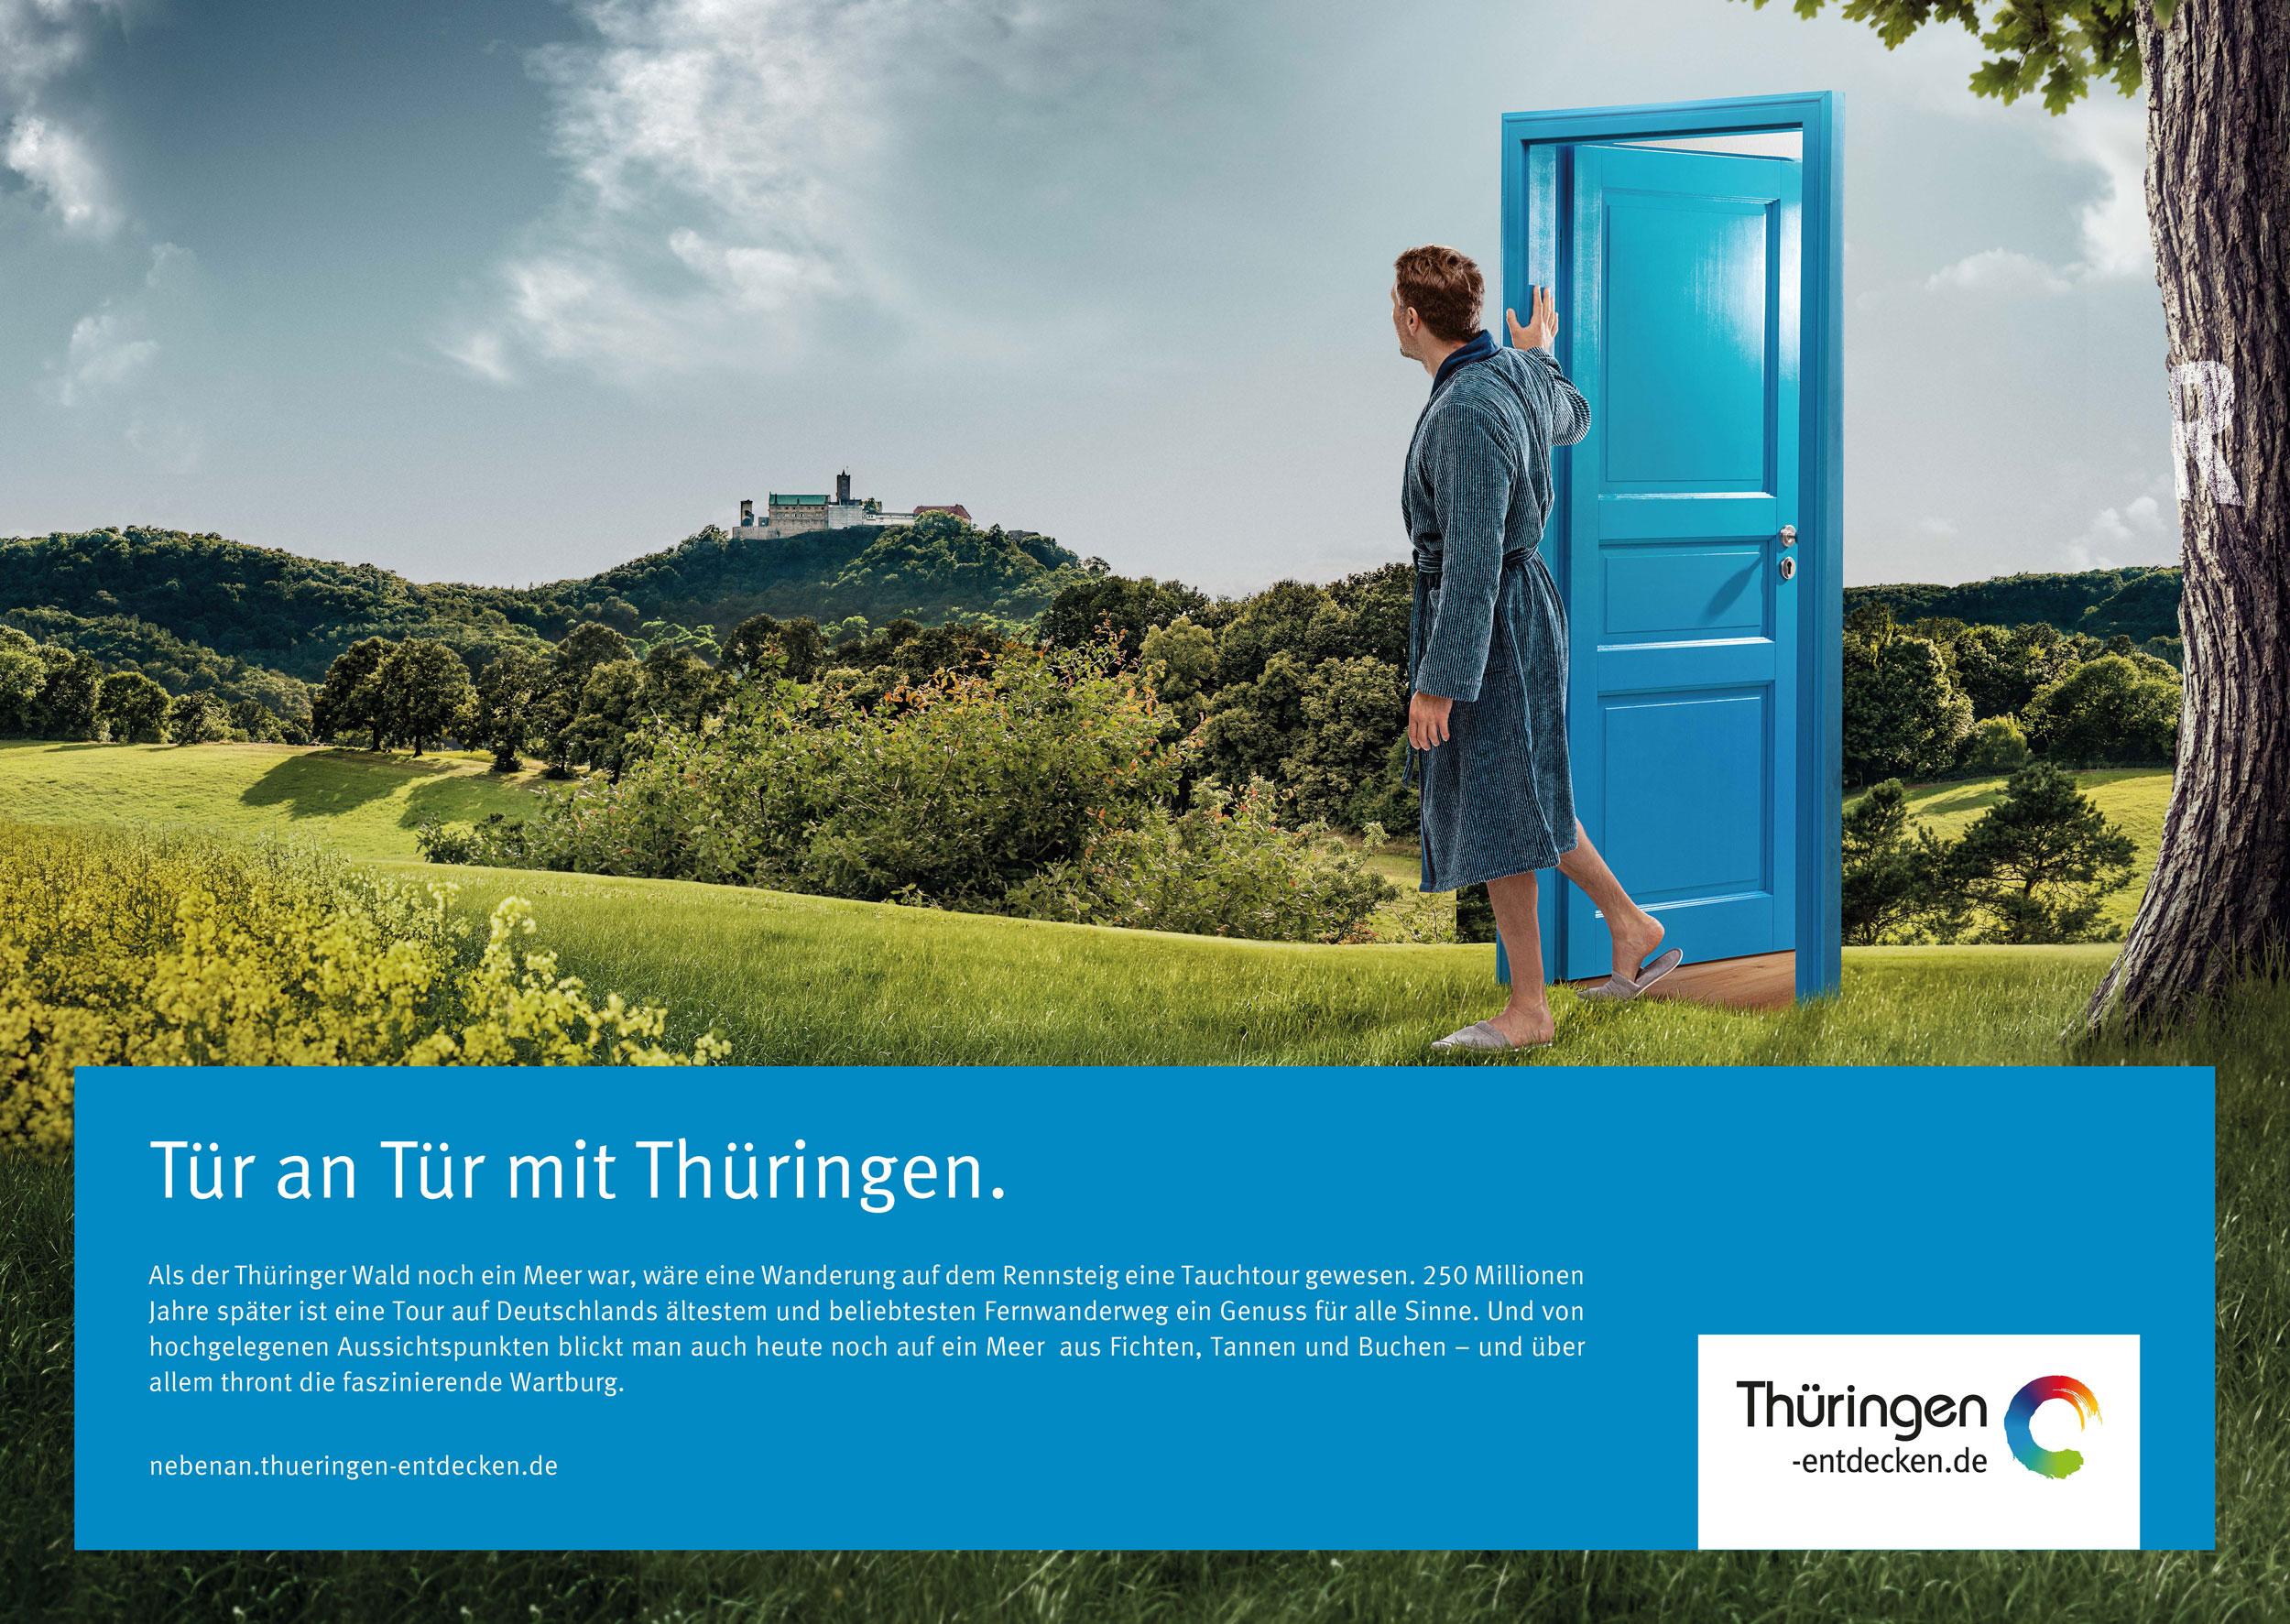 Tür an Tür mit Thüringen 18/1-Motiv Thüringer Wald